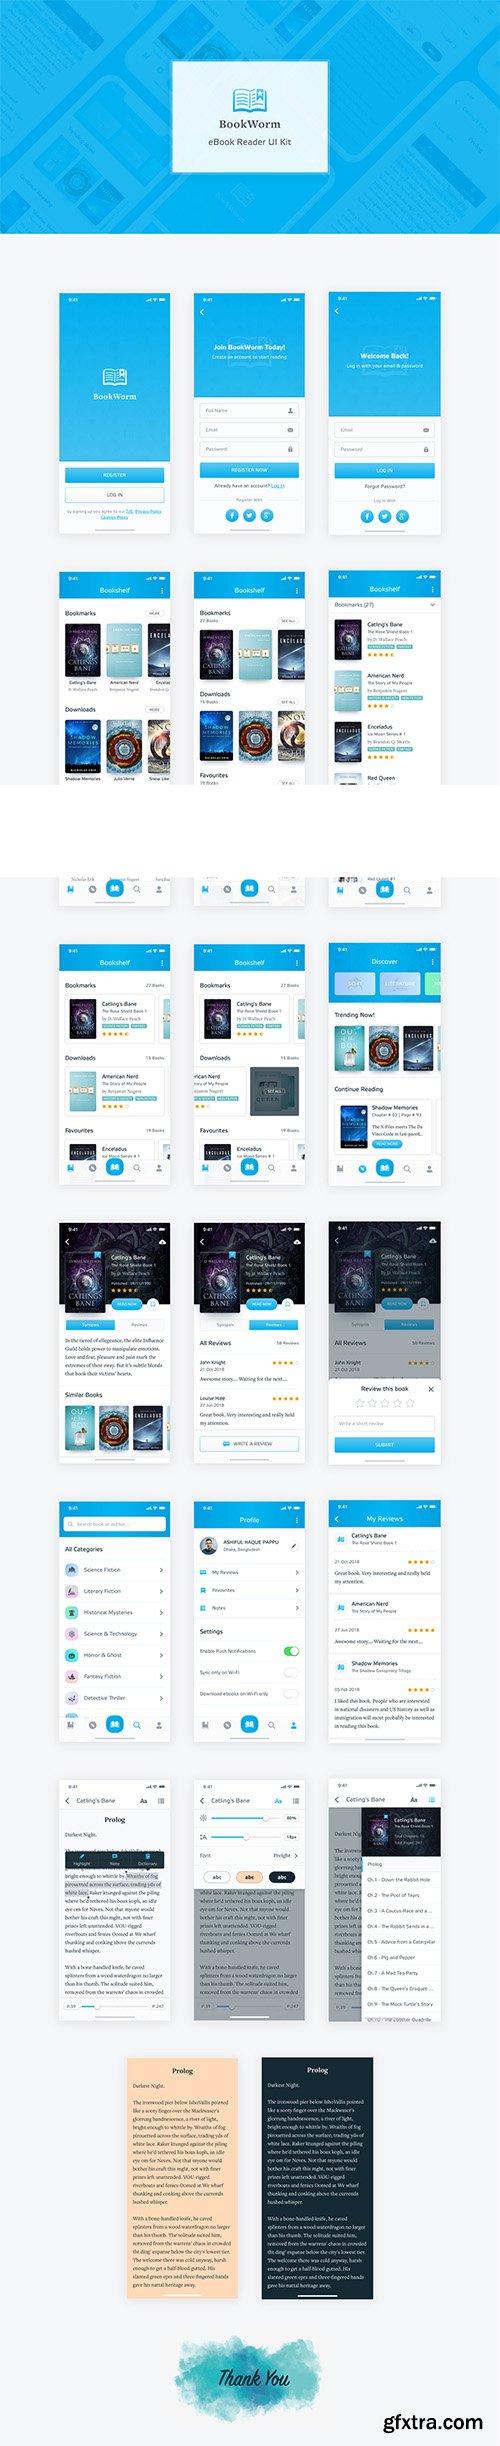 BookWorm eBook Reader UI Kit